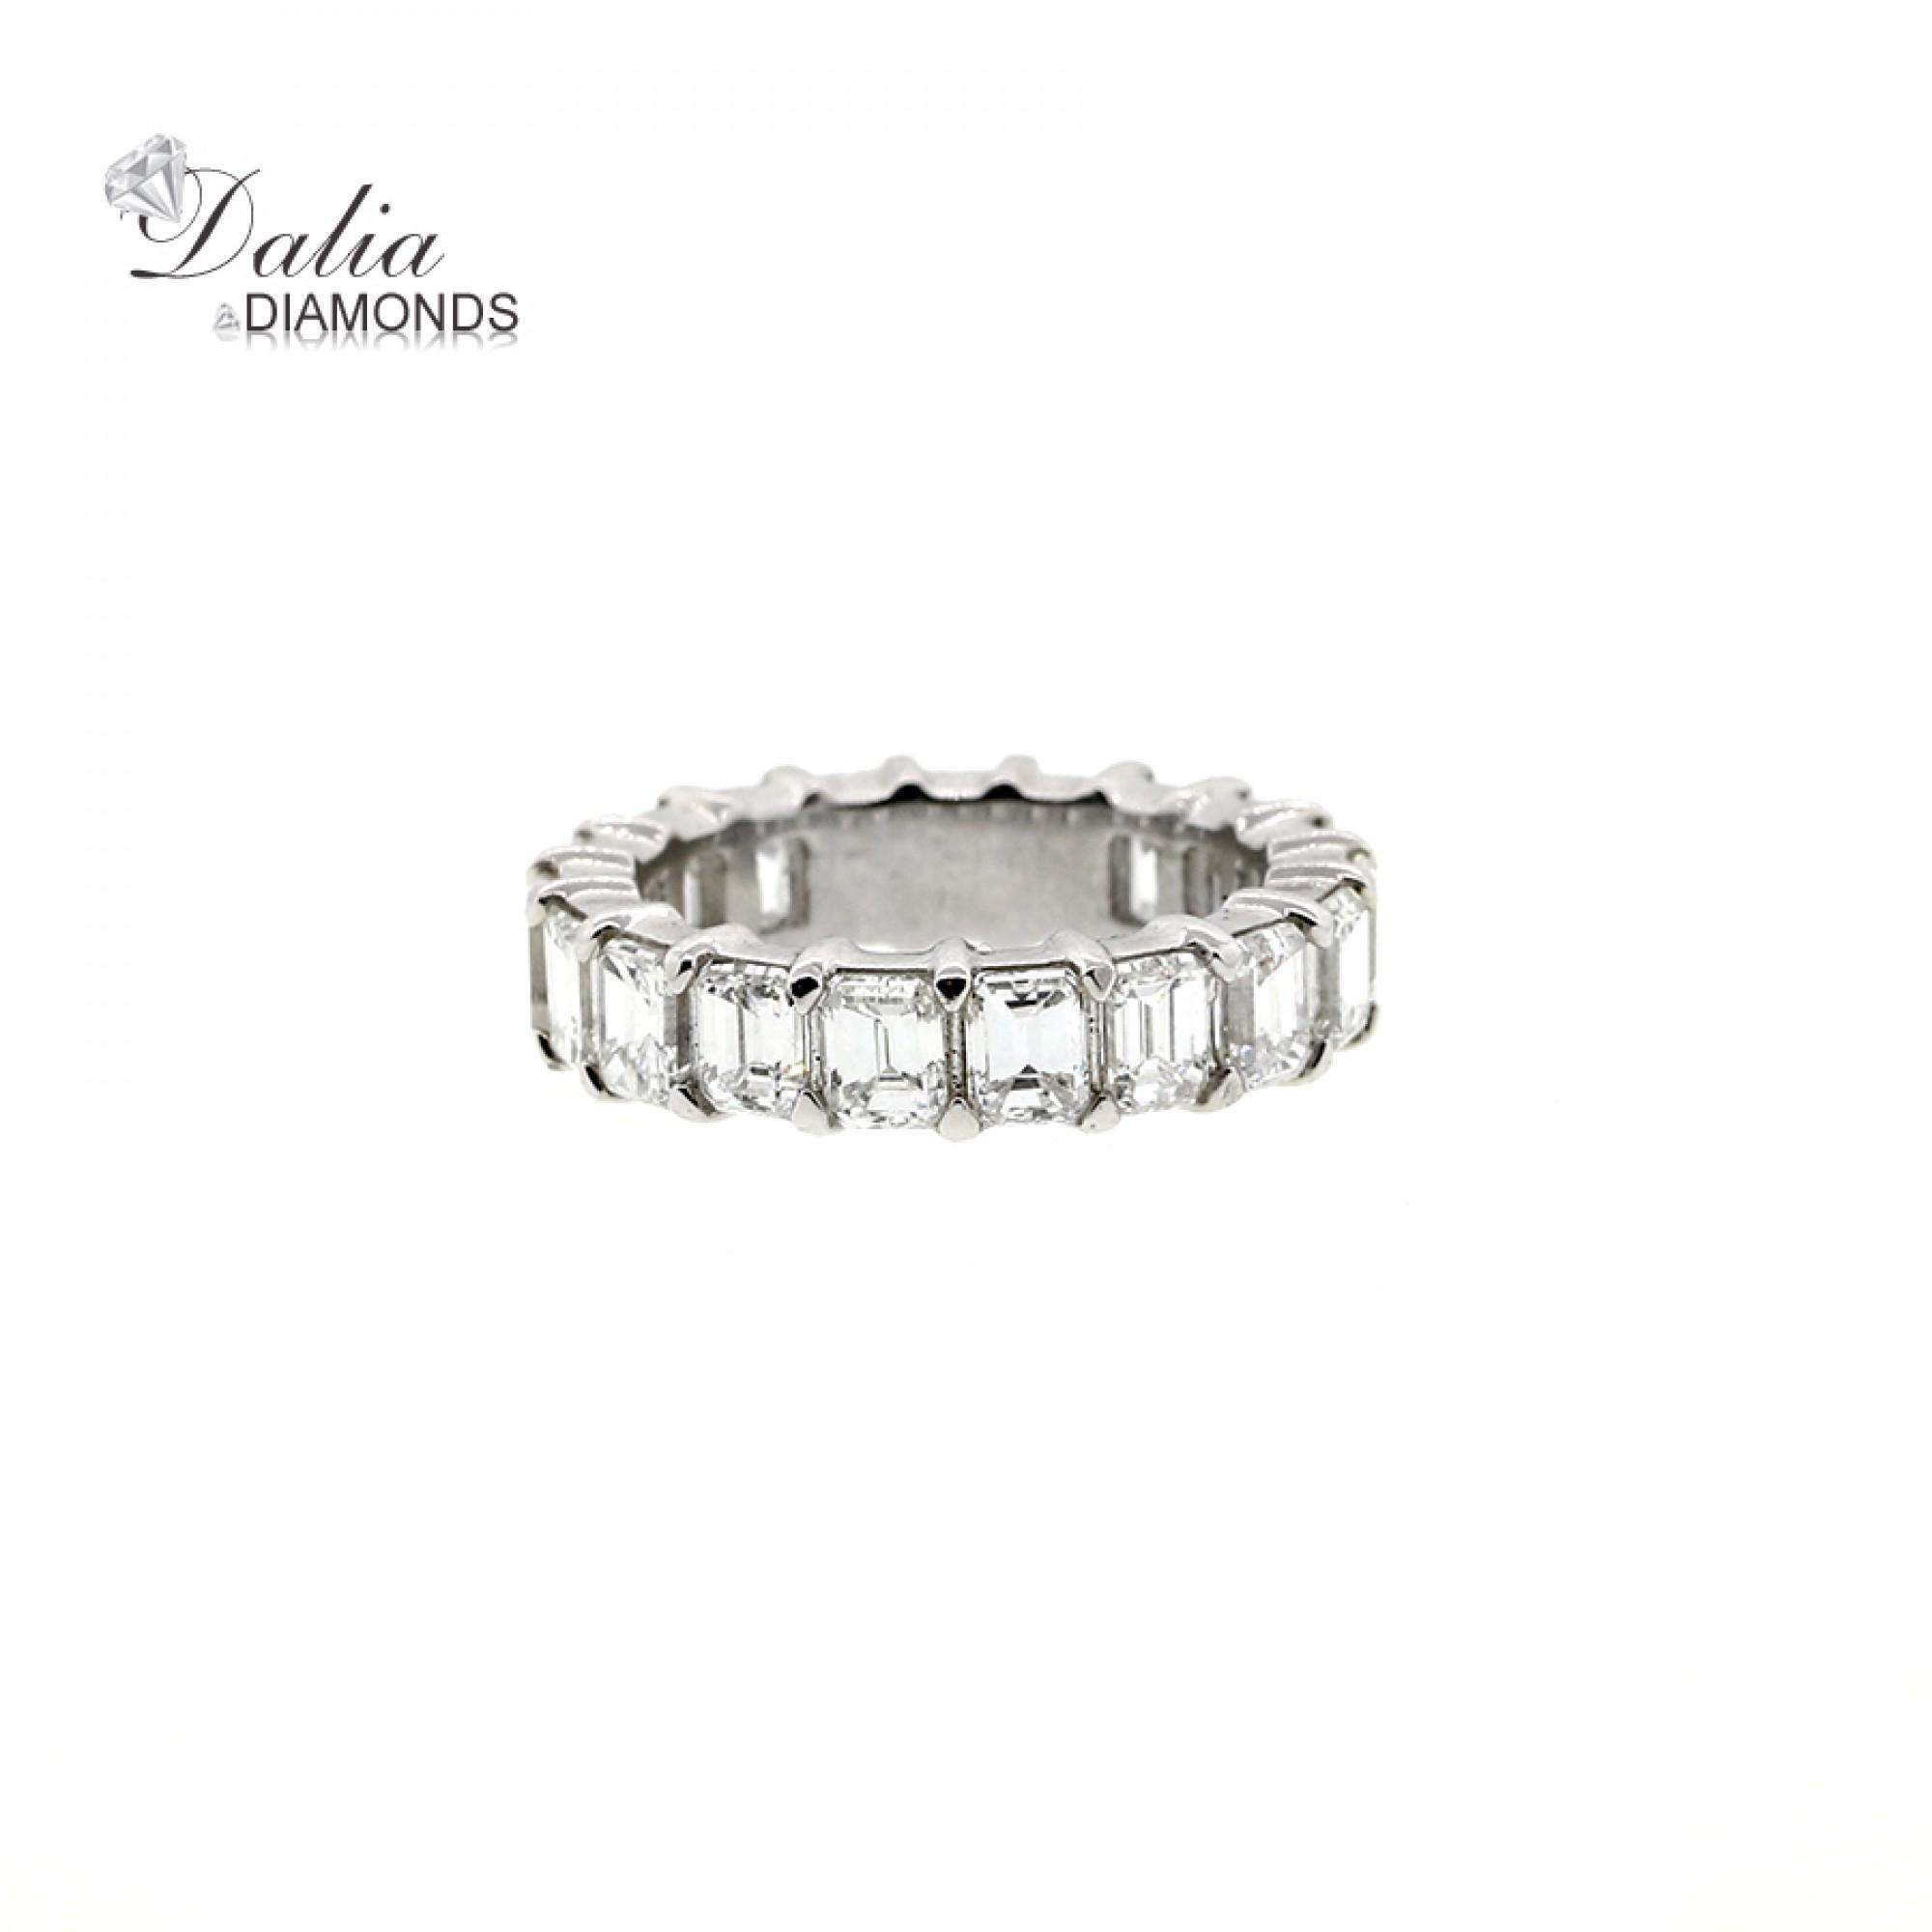 1136c855ecf63 6.33 Cts Emerald Cut Diamond Eternity Wedding Band set in Platinum ...